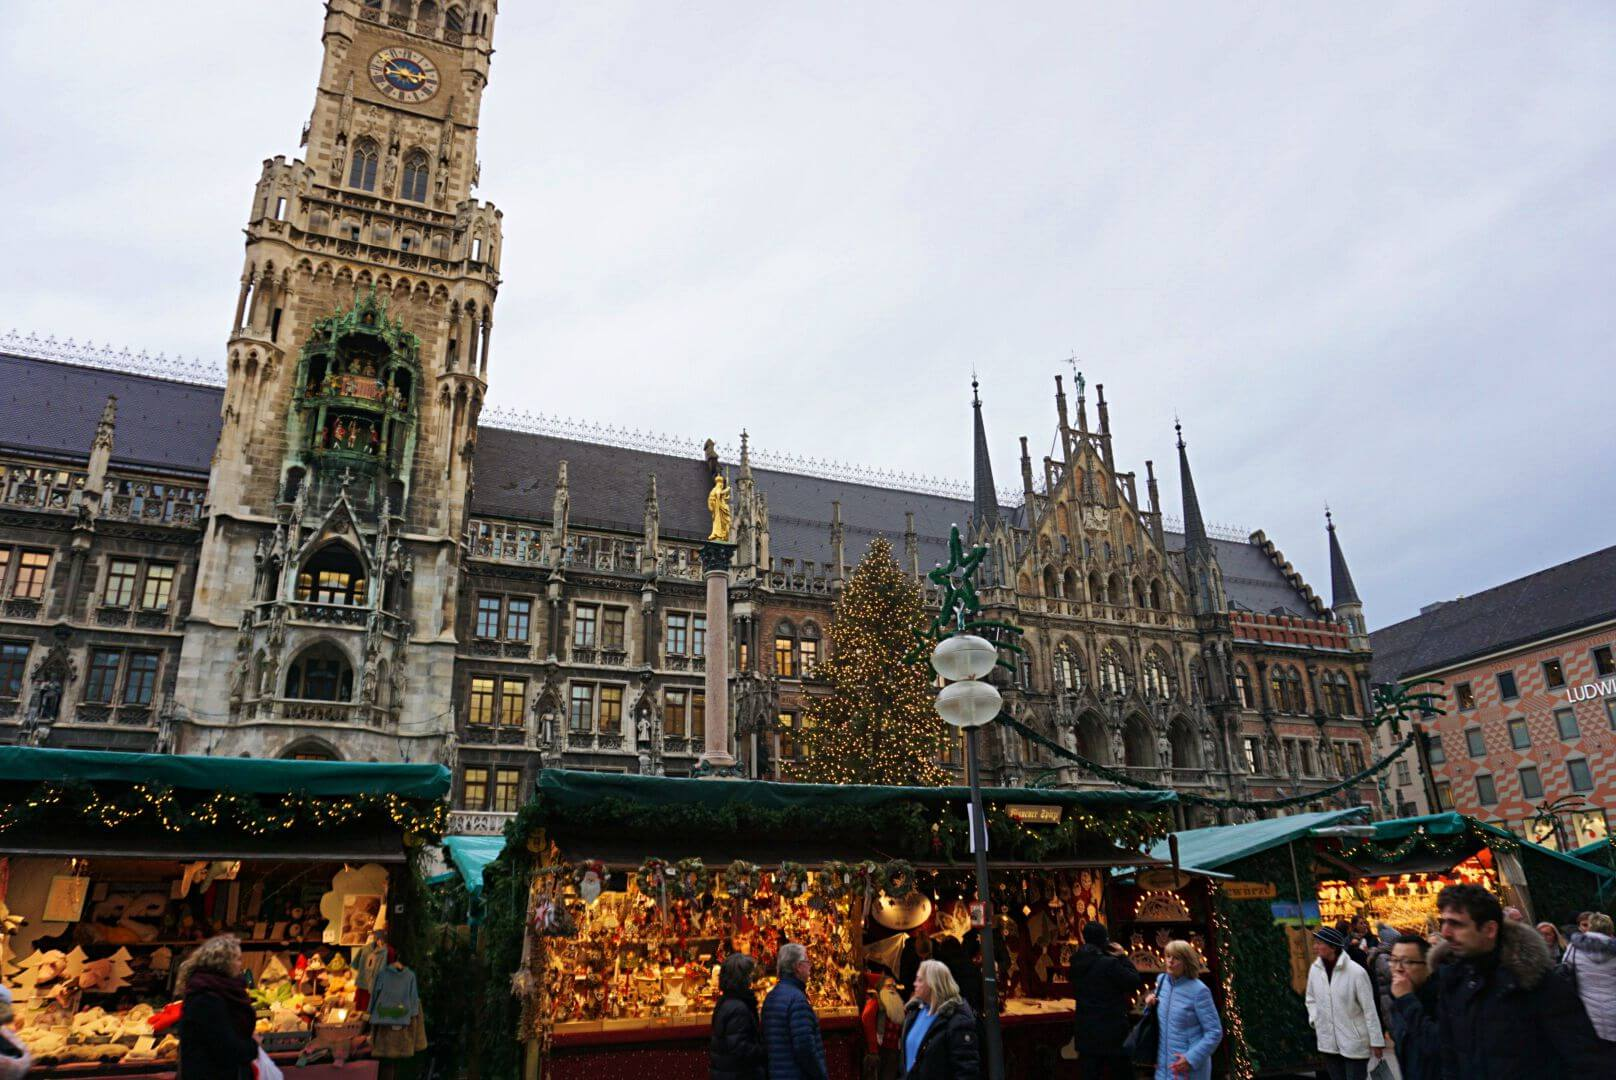 Mercado de Navidad de la Marienplatz